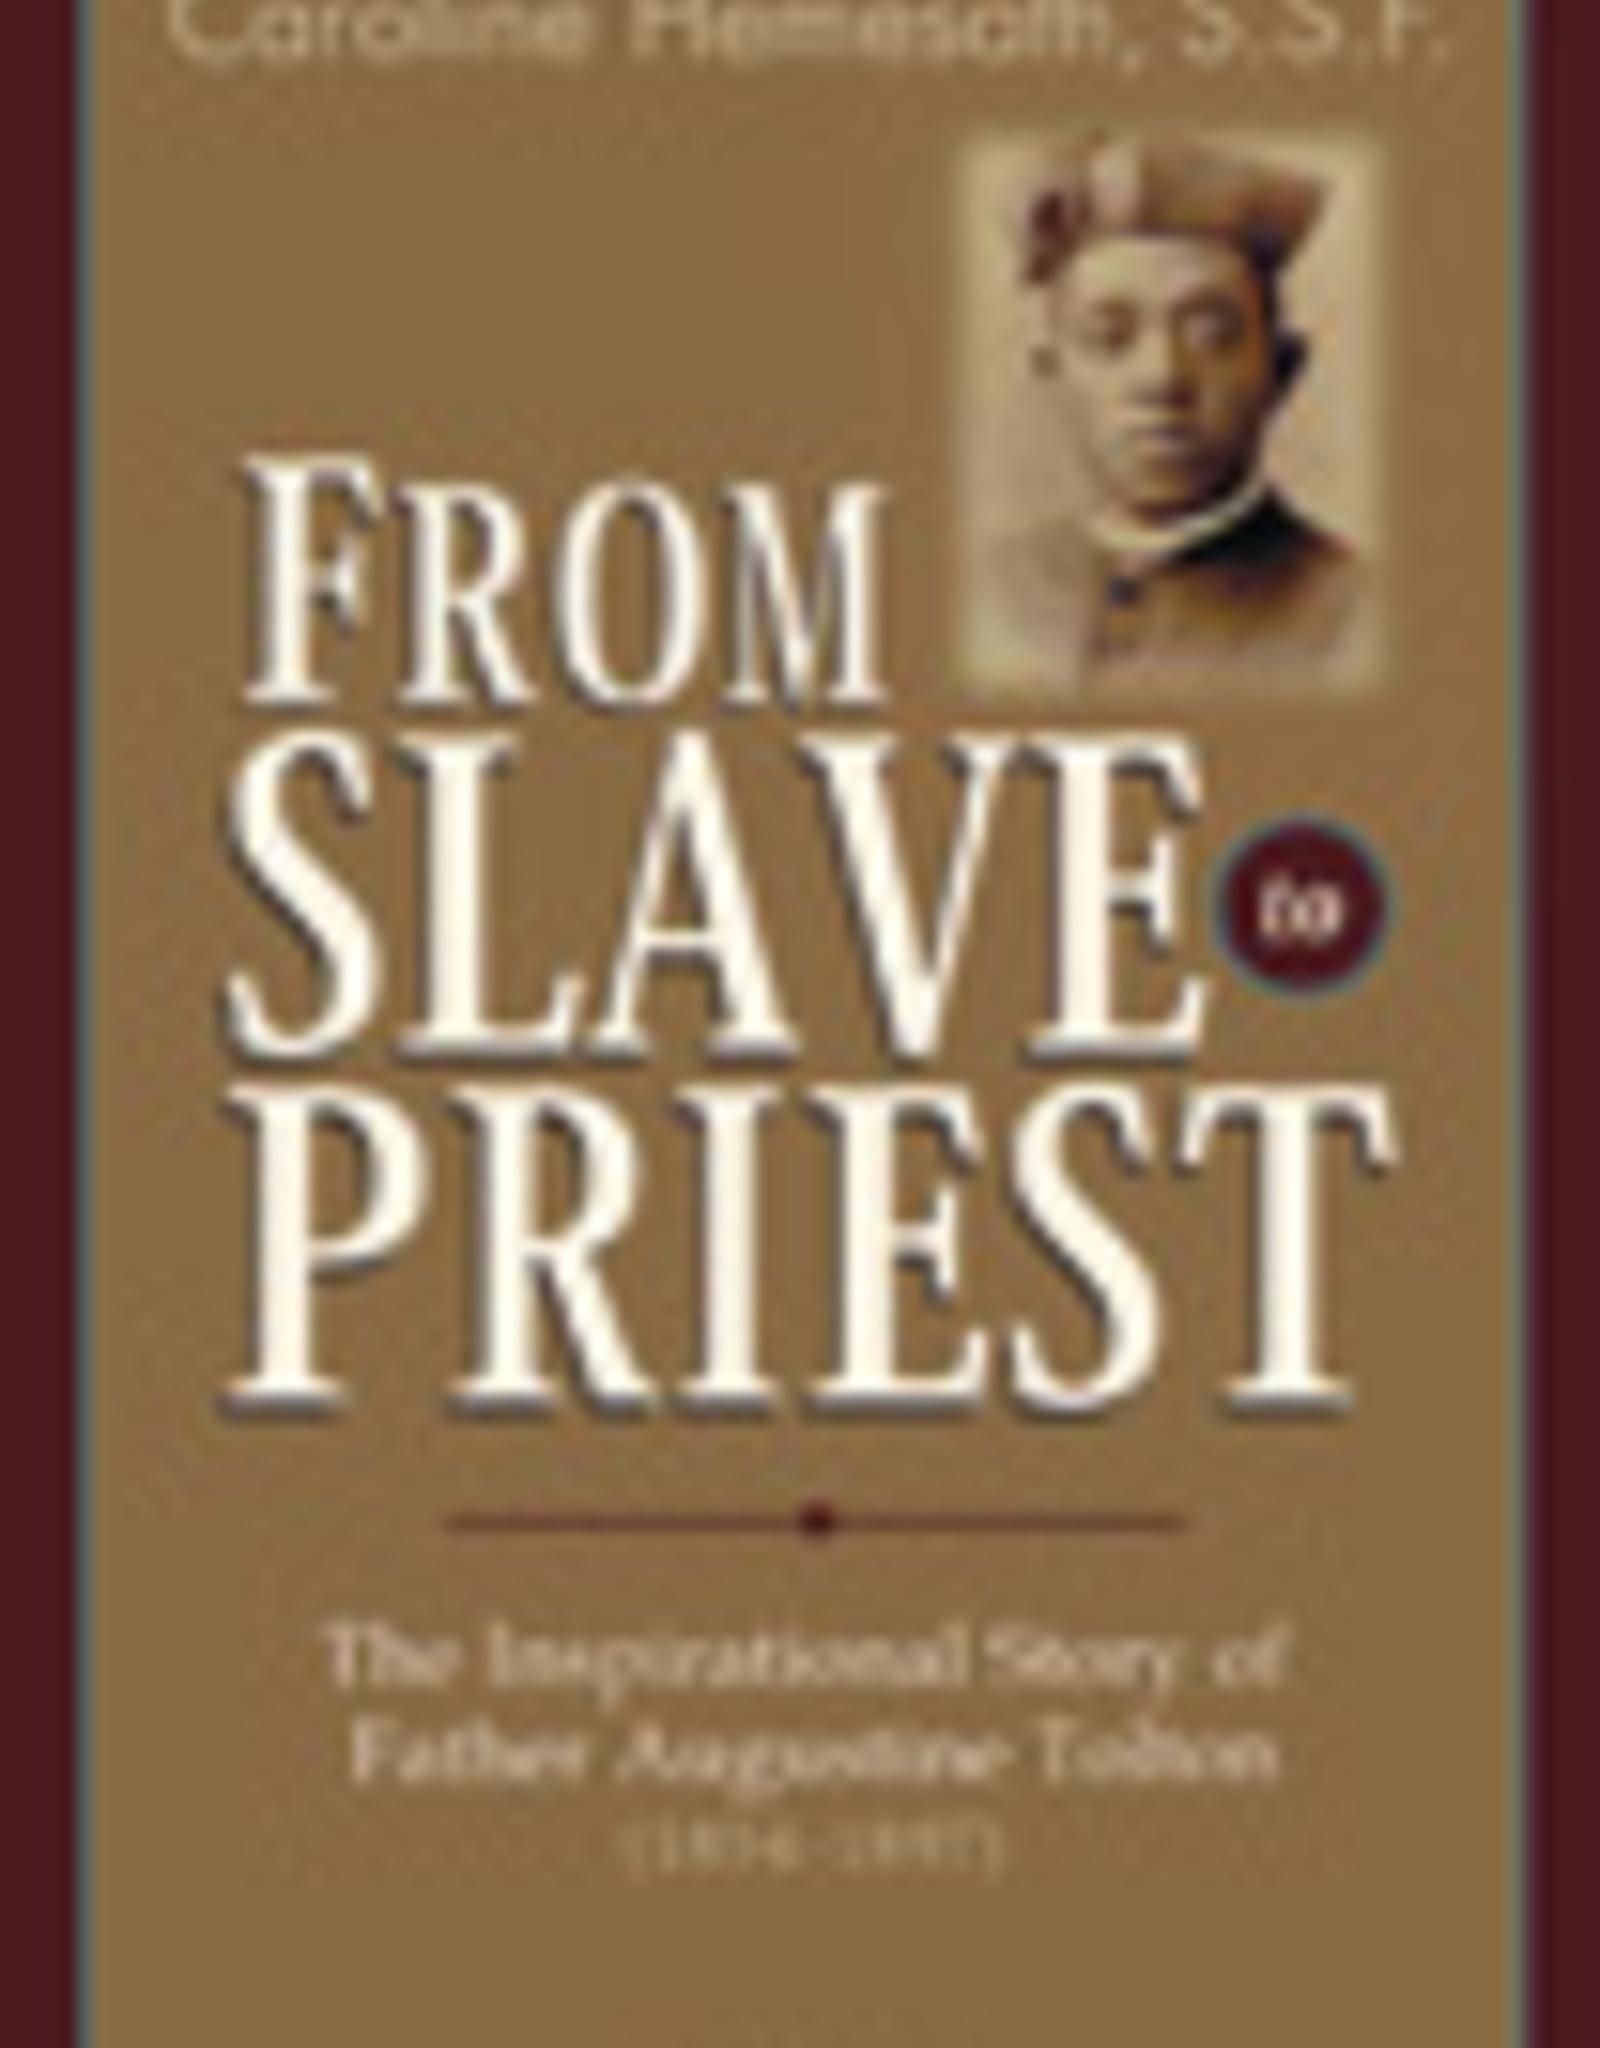 Ignatius Press From Slave to Priest, by Sister Caroline Hemesath (paperback)